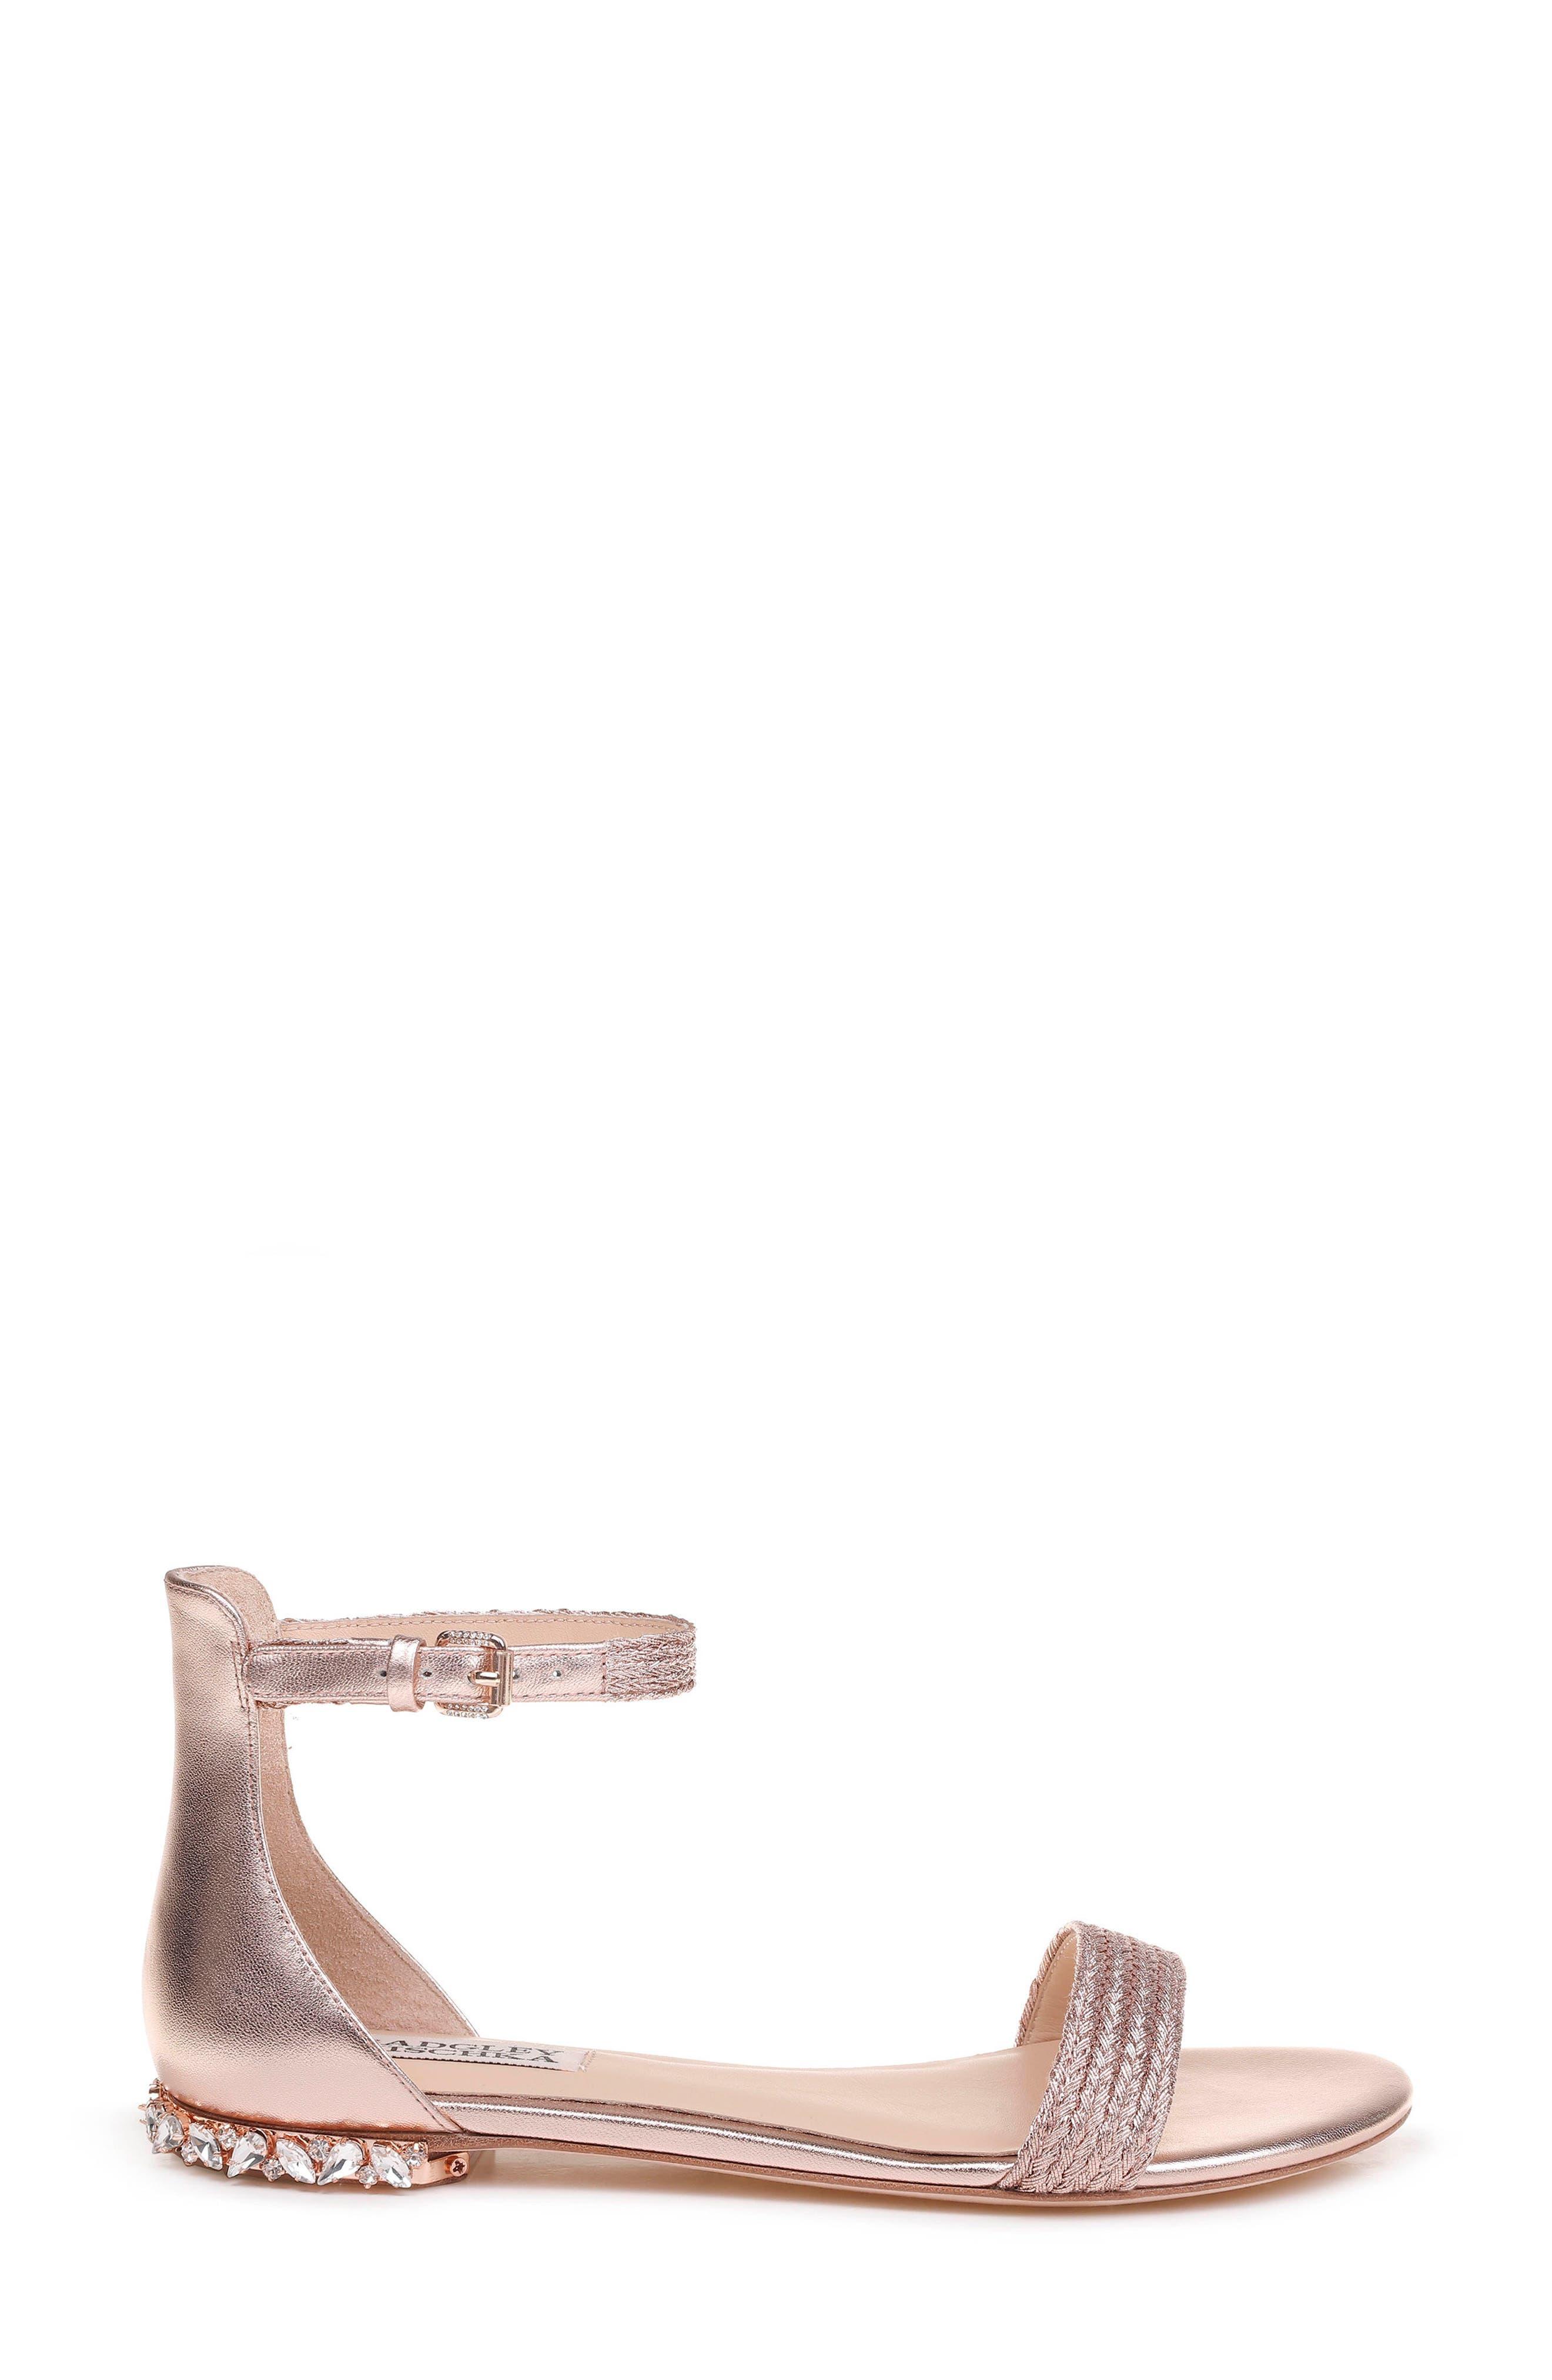 Steffie Ankle Strap Sandal,                             Alternate thumbnail 3, color,                             ROSE GOLD LEATHER